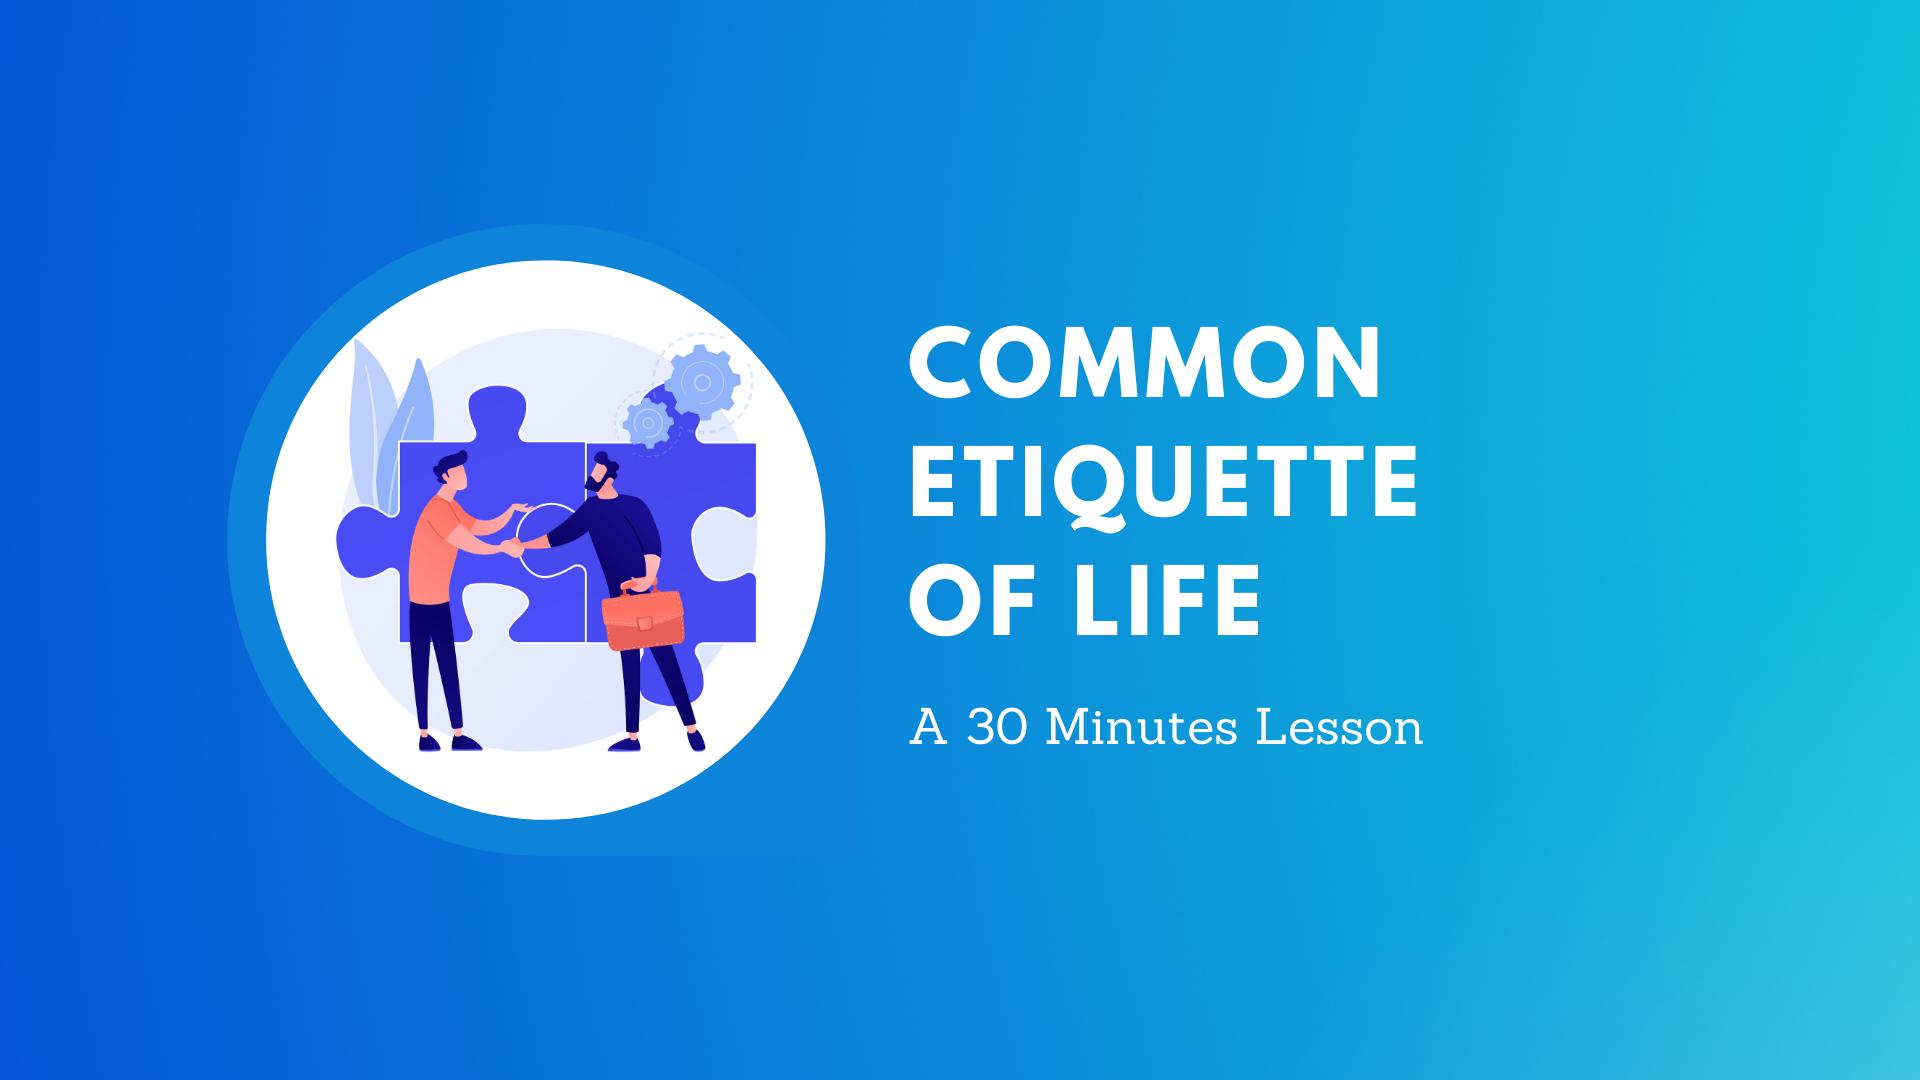 Common Etiquette of Life course image